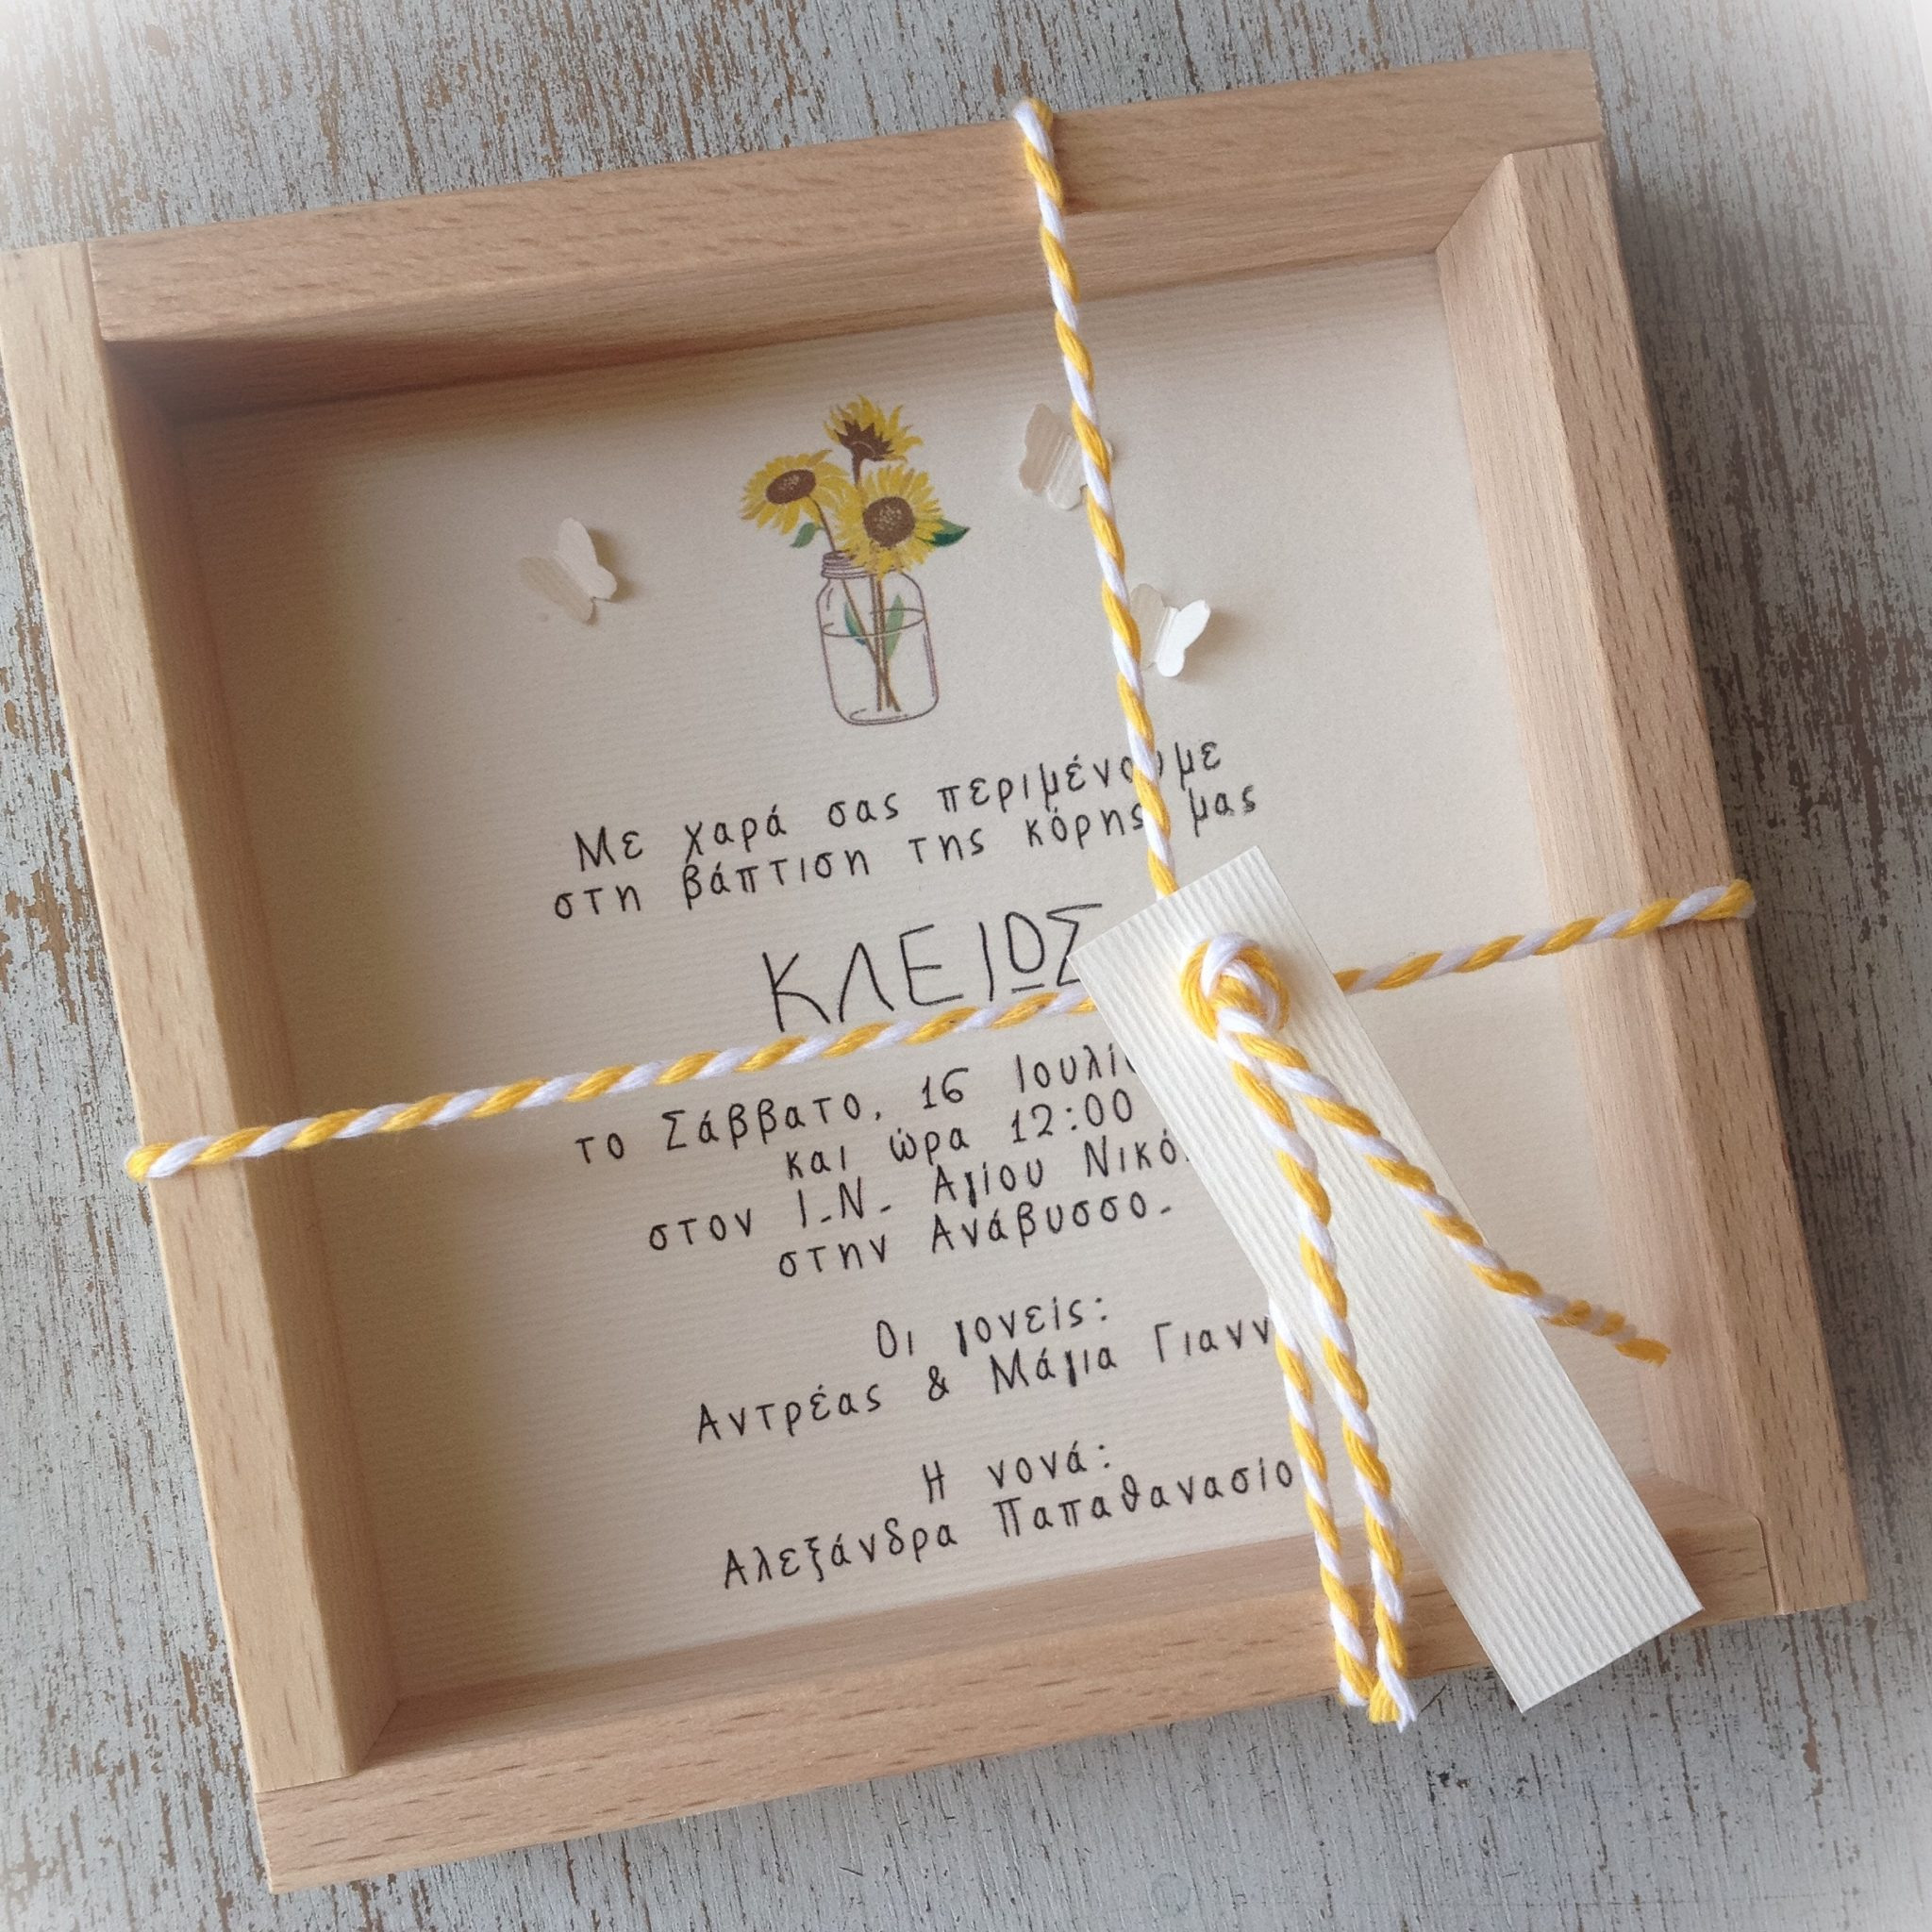 Sunflowers-baptism invitation proposal b